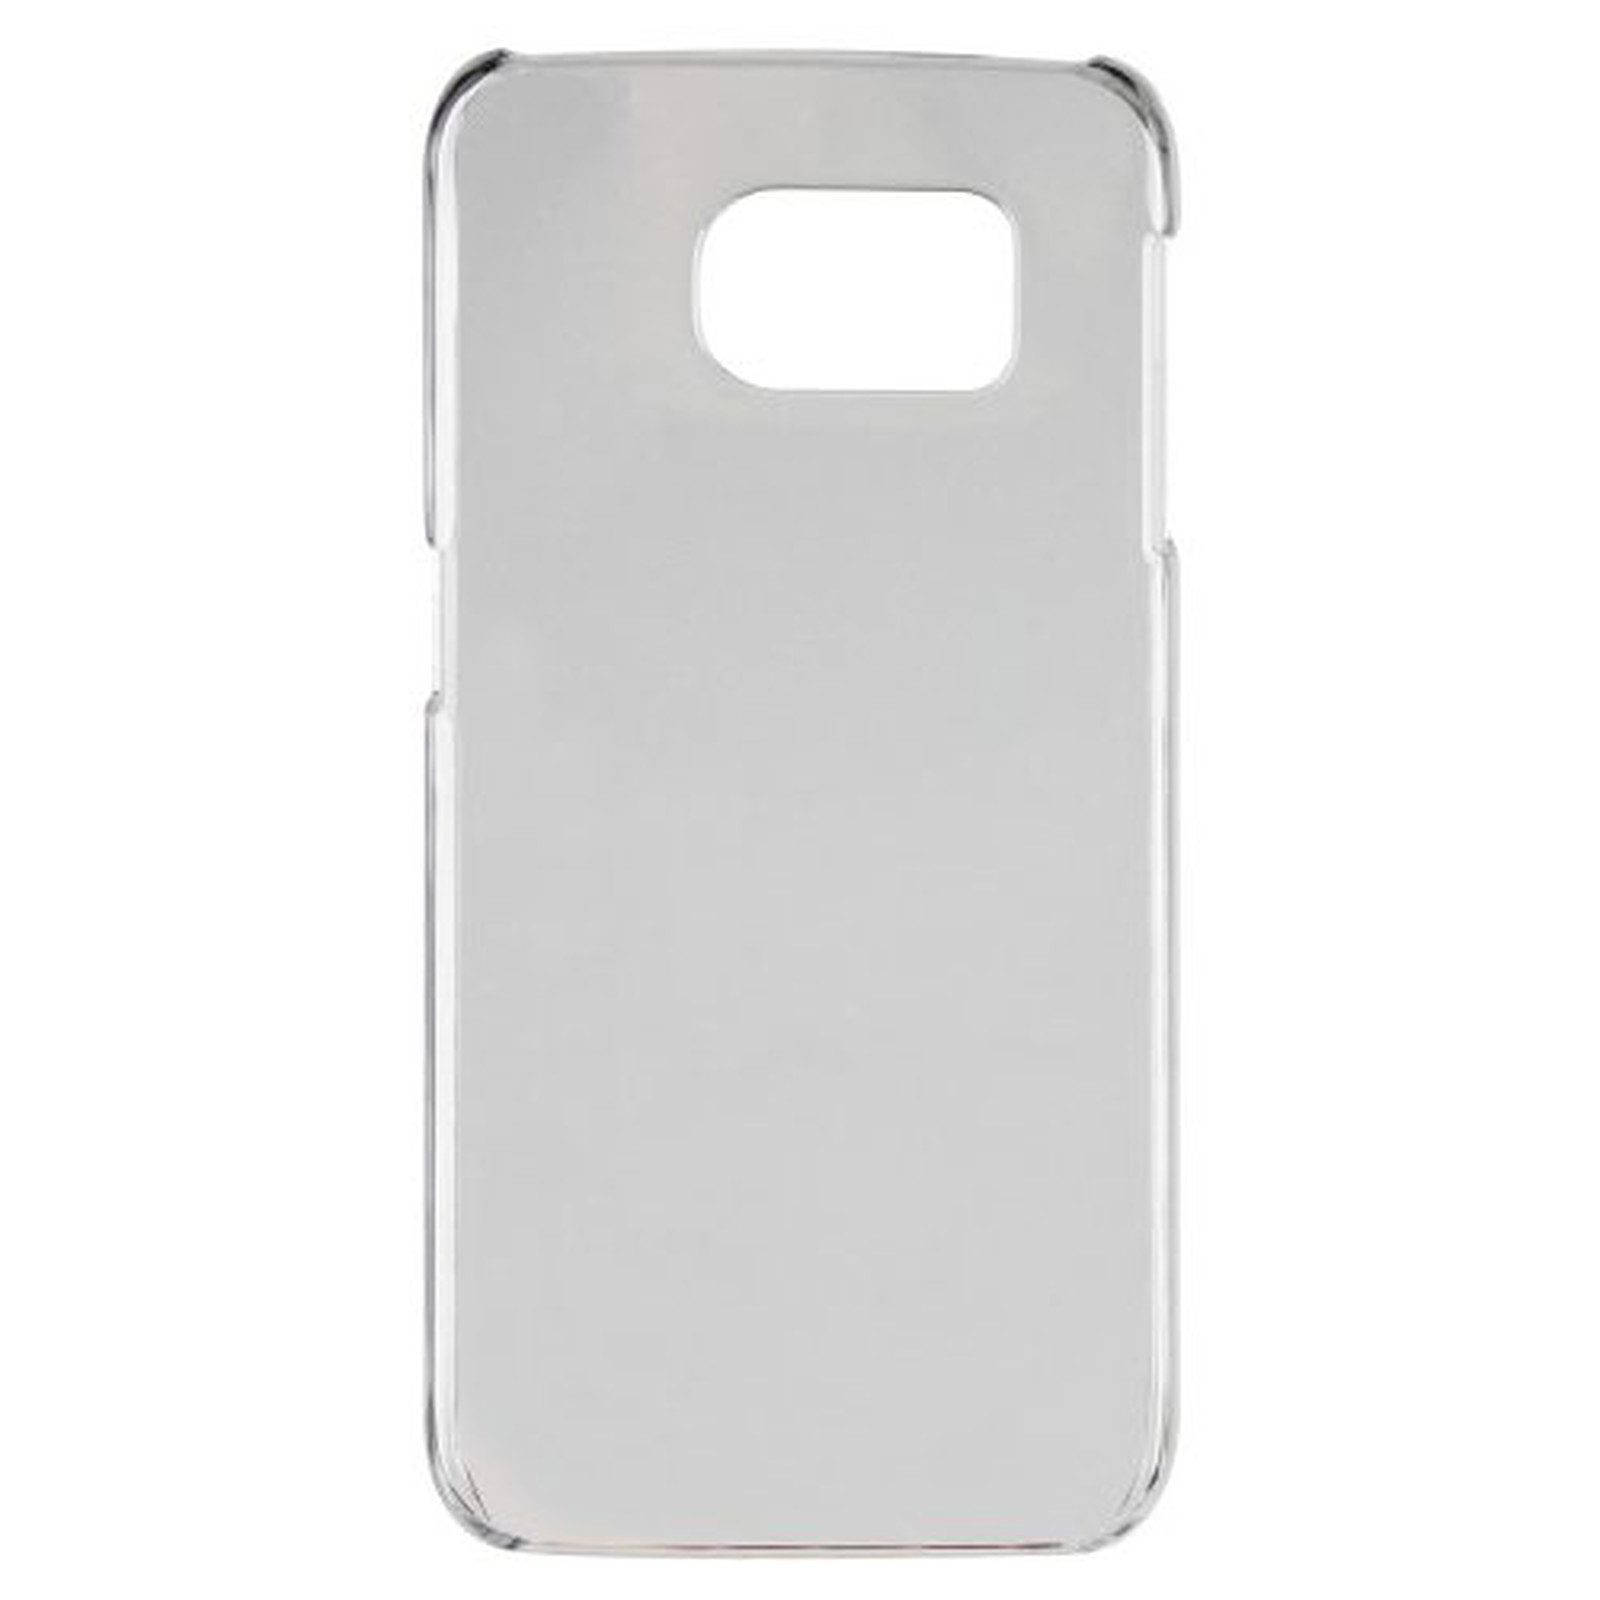 xqisit Coque iPlate Glossy Galaxy S6